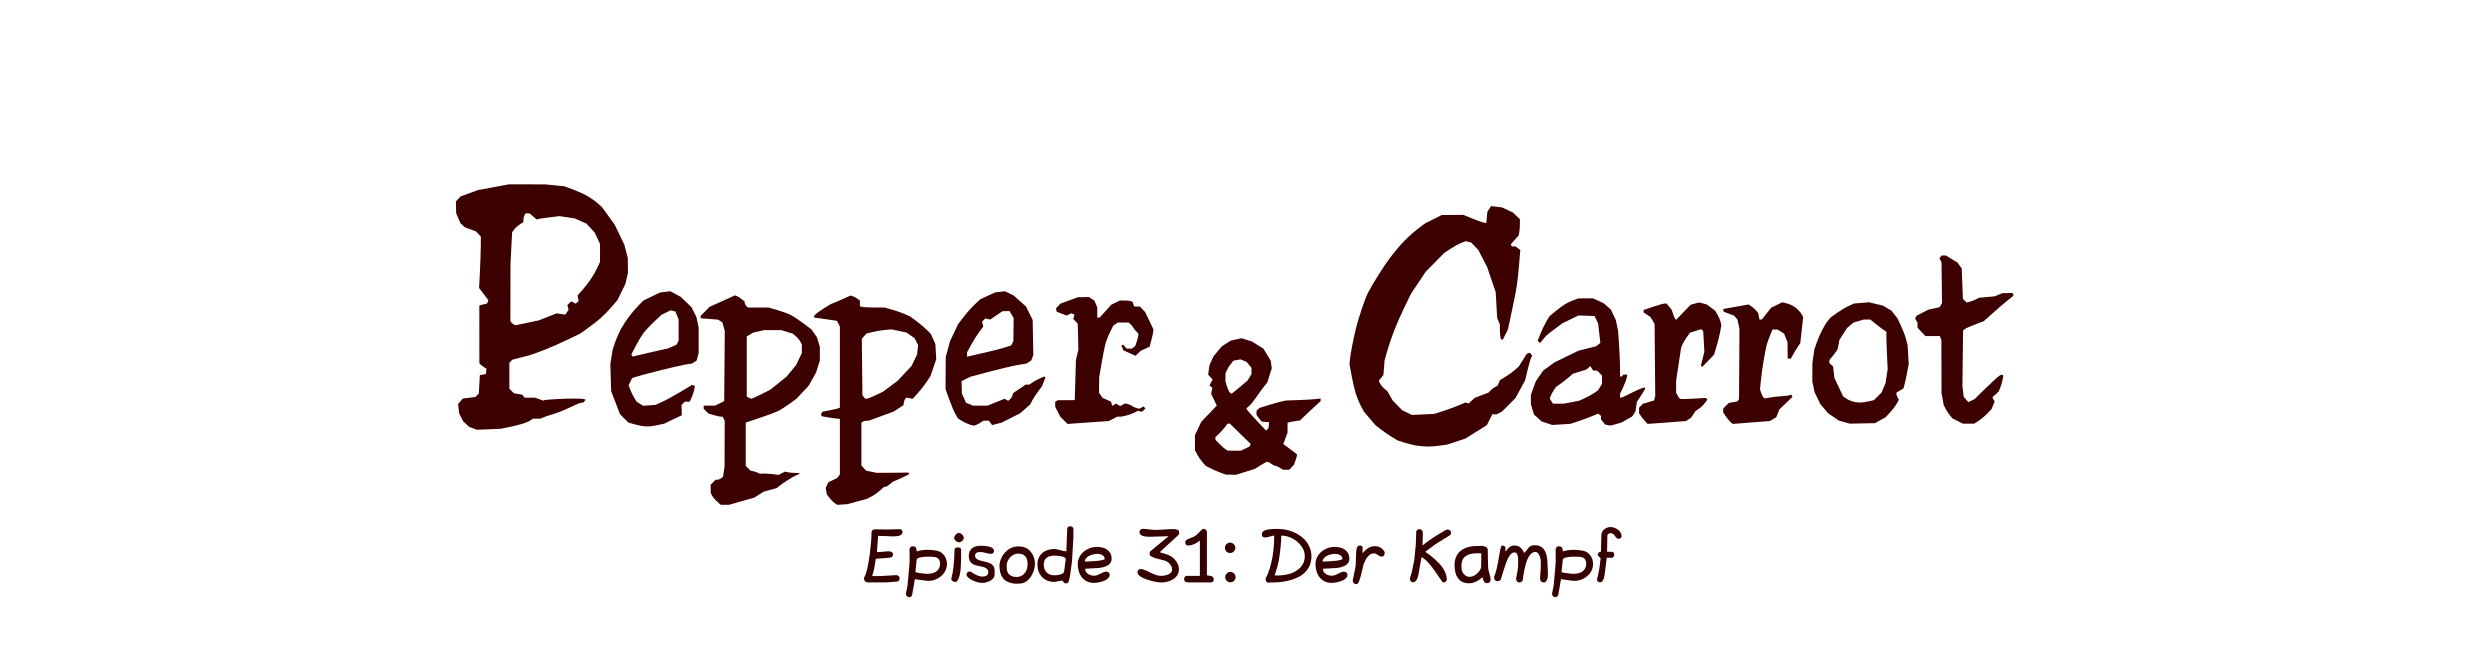 Episode 31: Der Kampf